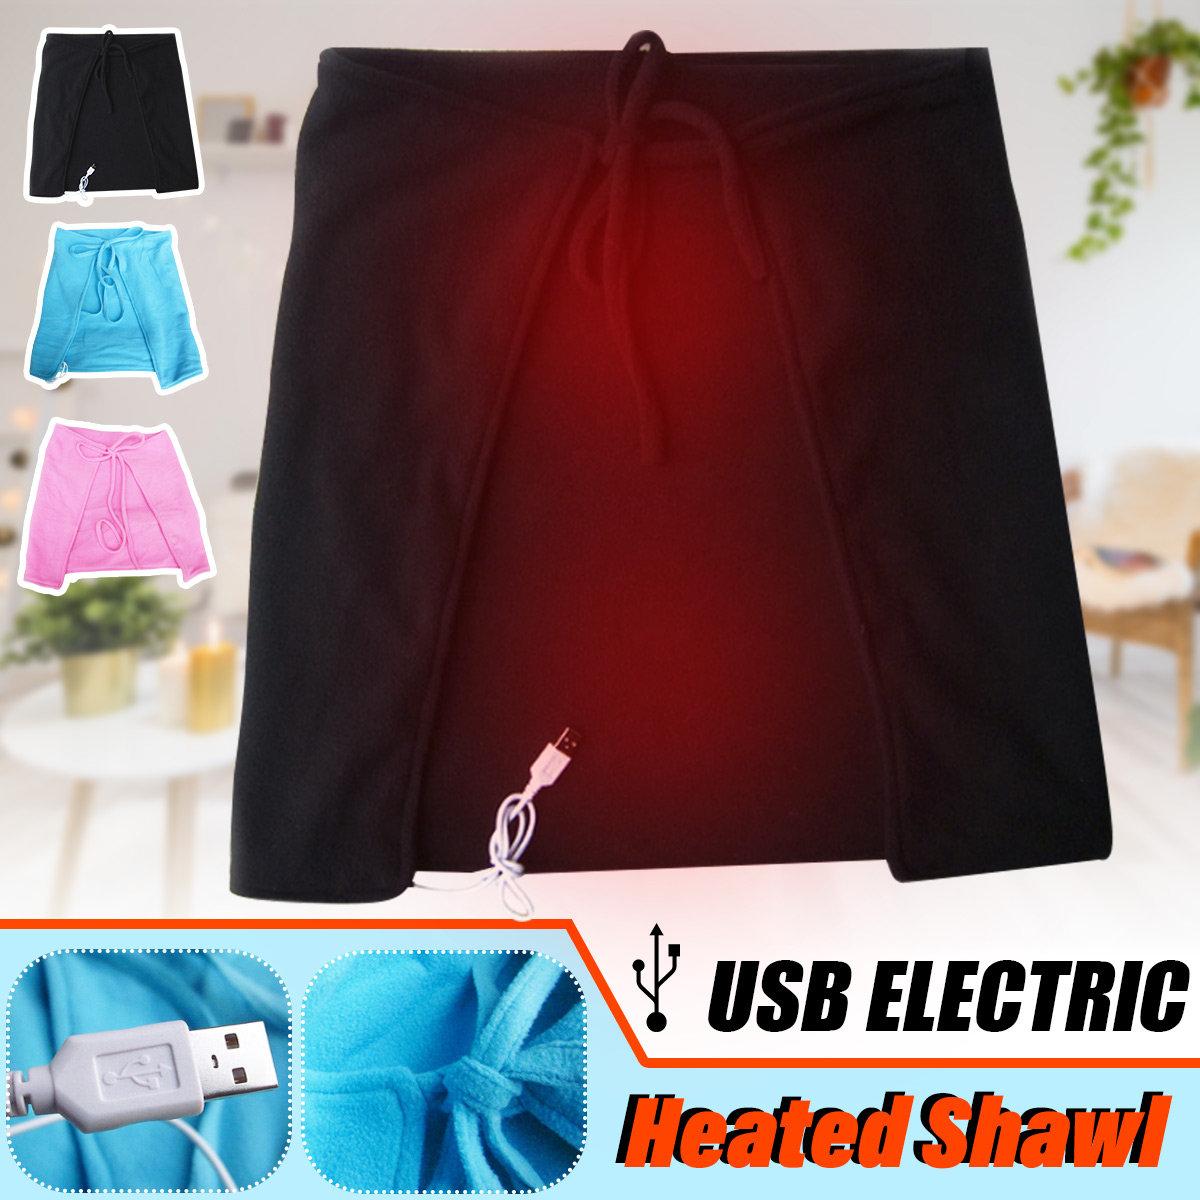 USB Electric Blanket Shawl Velvet Knee Heated Blanket Neck Care Blanket Personal Health Care